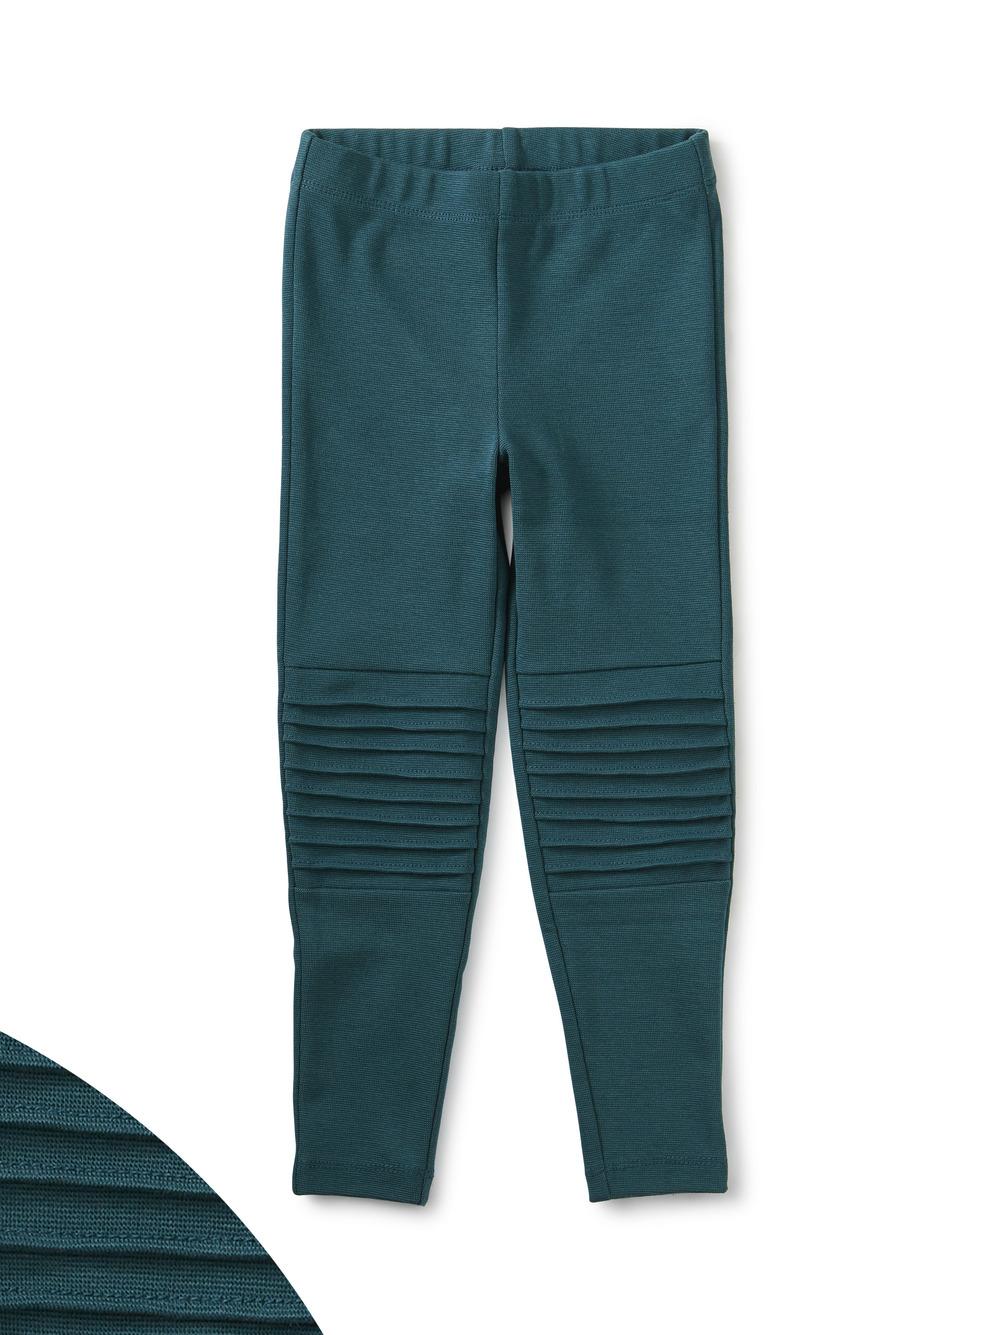 Reinforced Knee Moto Pants